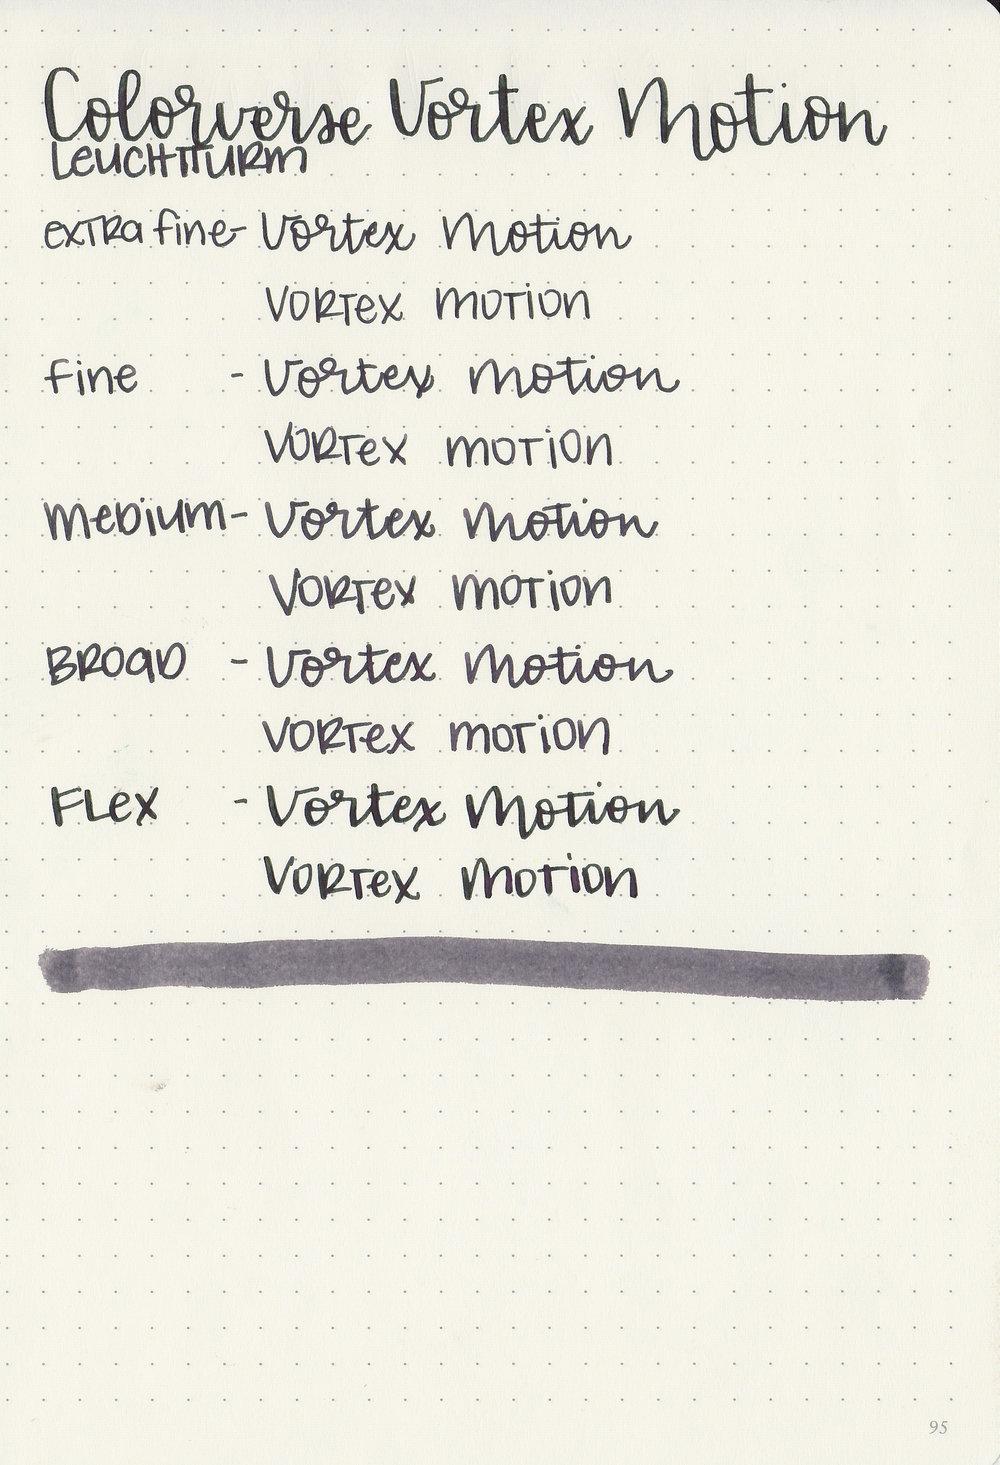 cv-vortex-motion-9.jpg